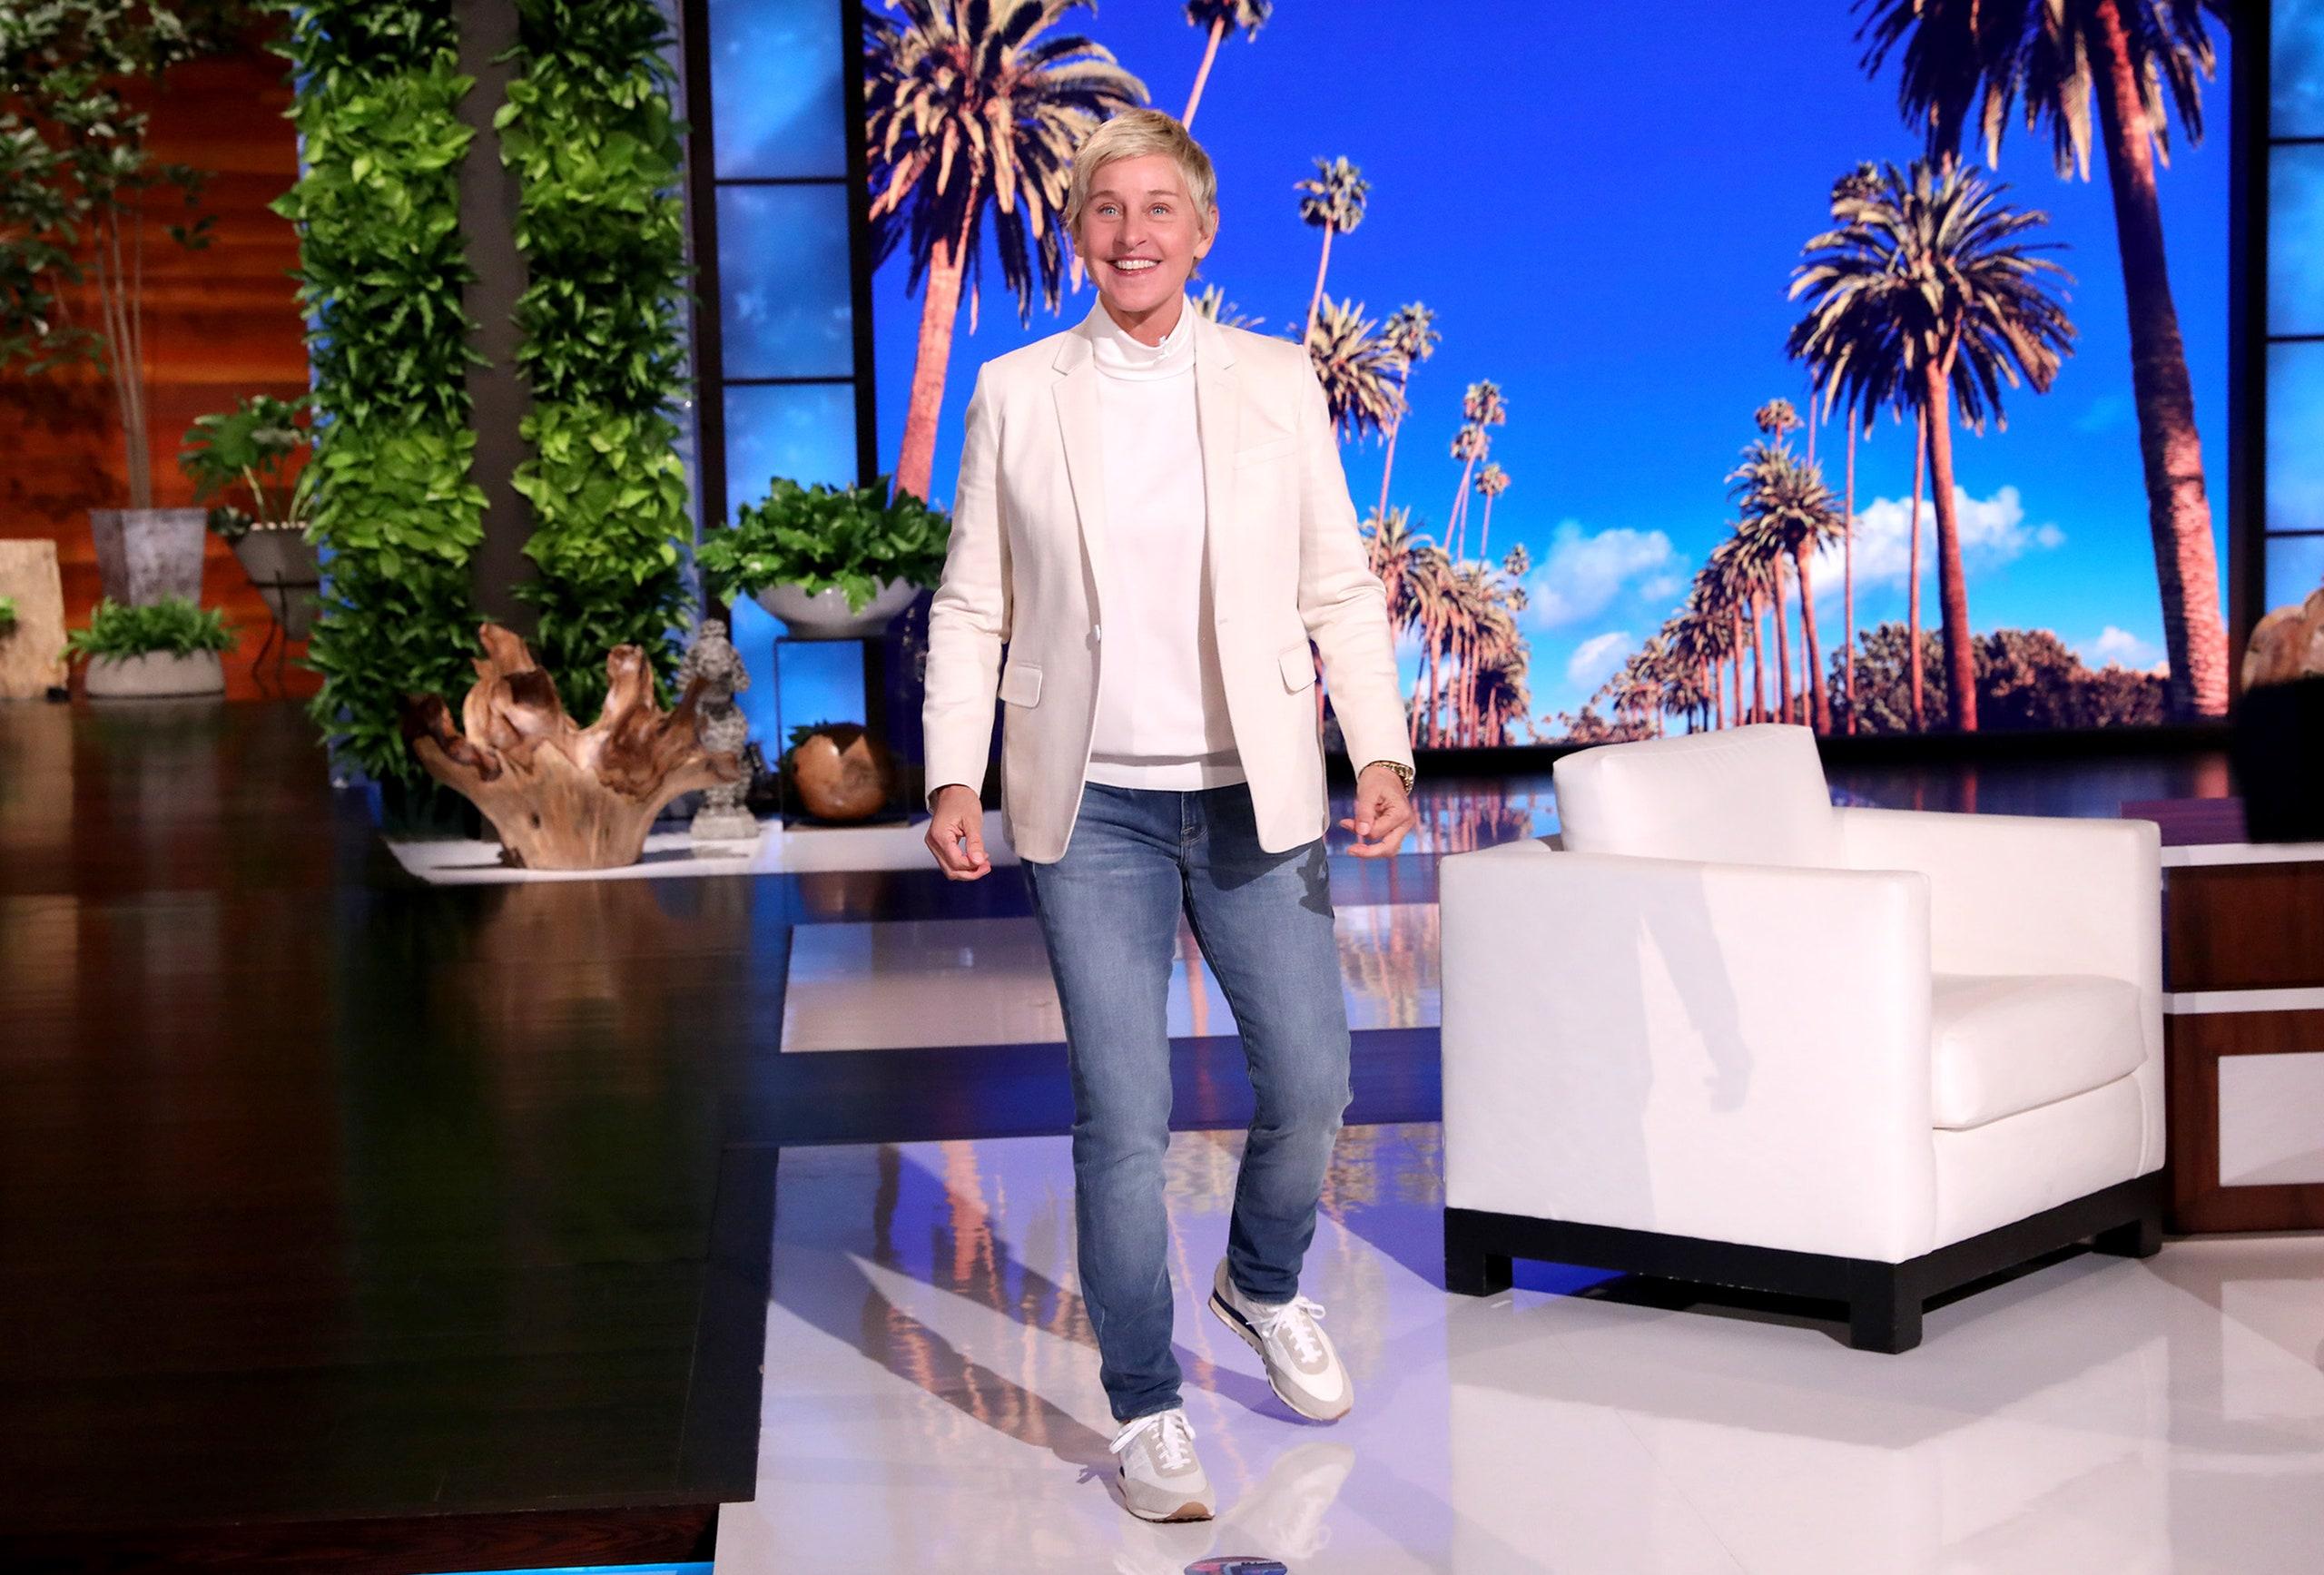 Ellen DeGeneres: Τι καταλάβαμε από τον μονόλογό της στην πρεμιέρα της εκπομπής της